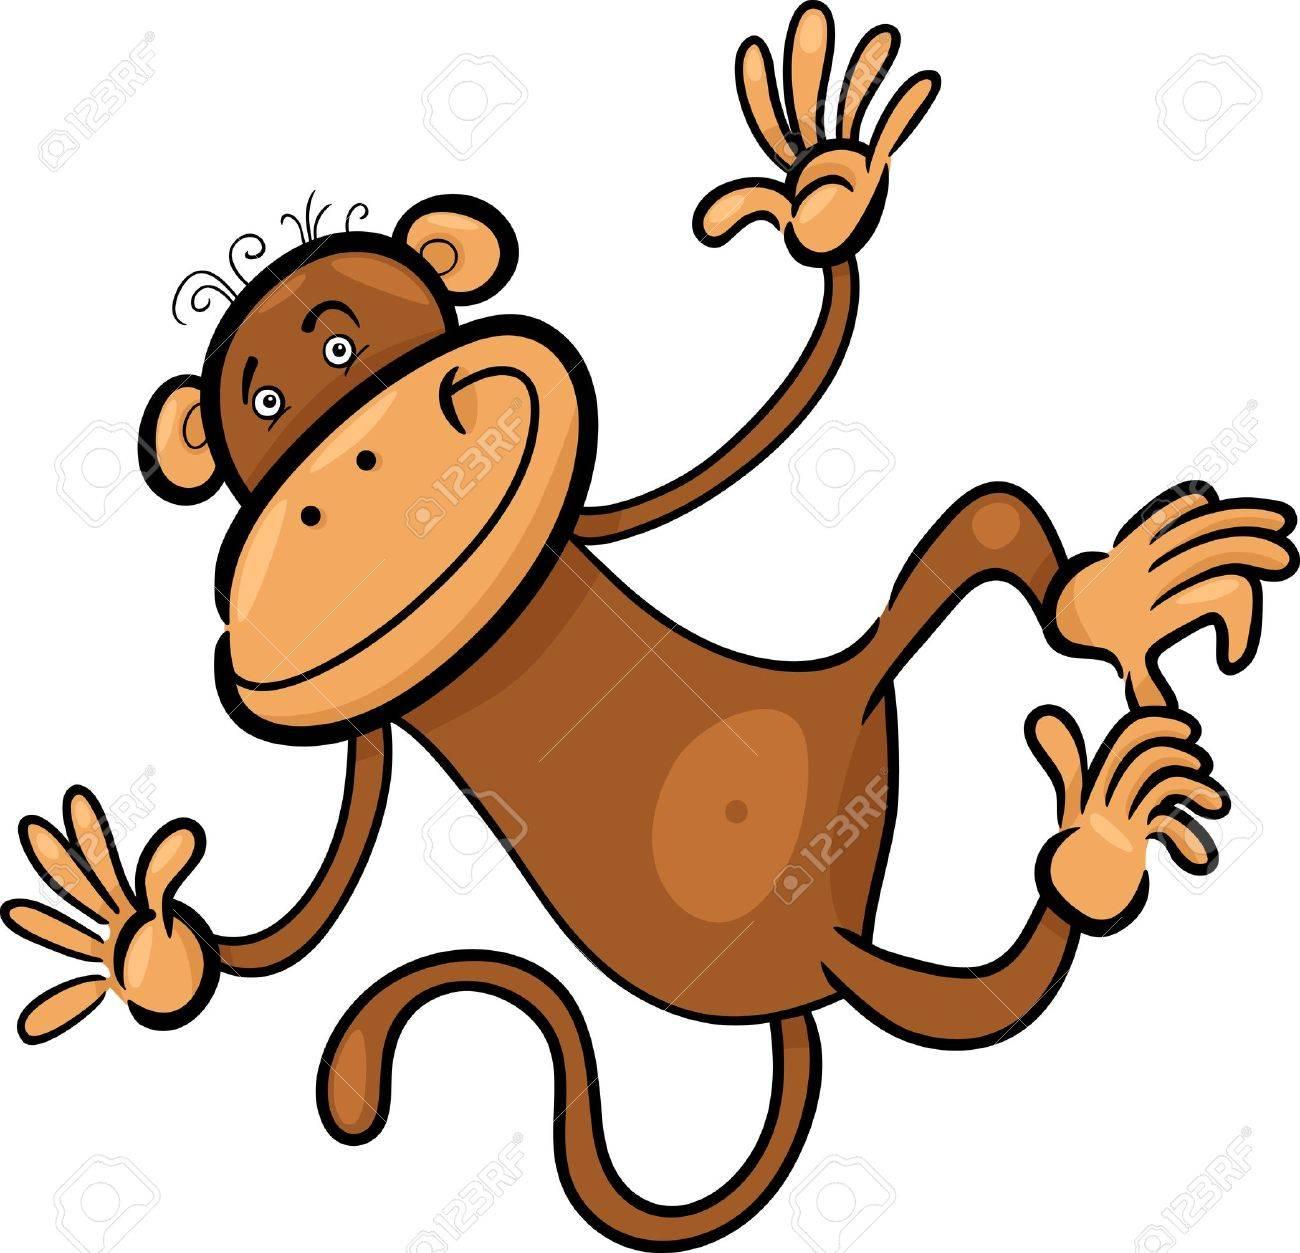 1300x1253 Cartoon Humorous Illustration Of Cute Funny Monkey Royalty Free